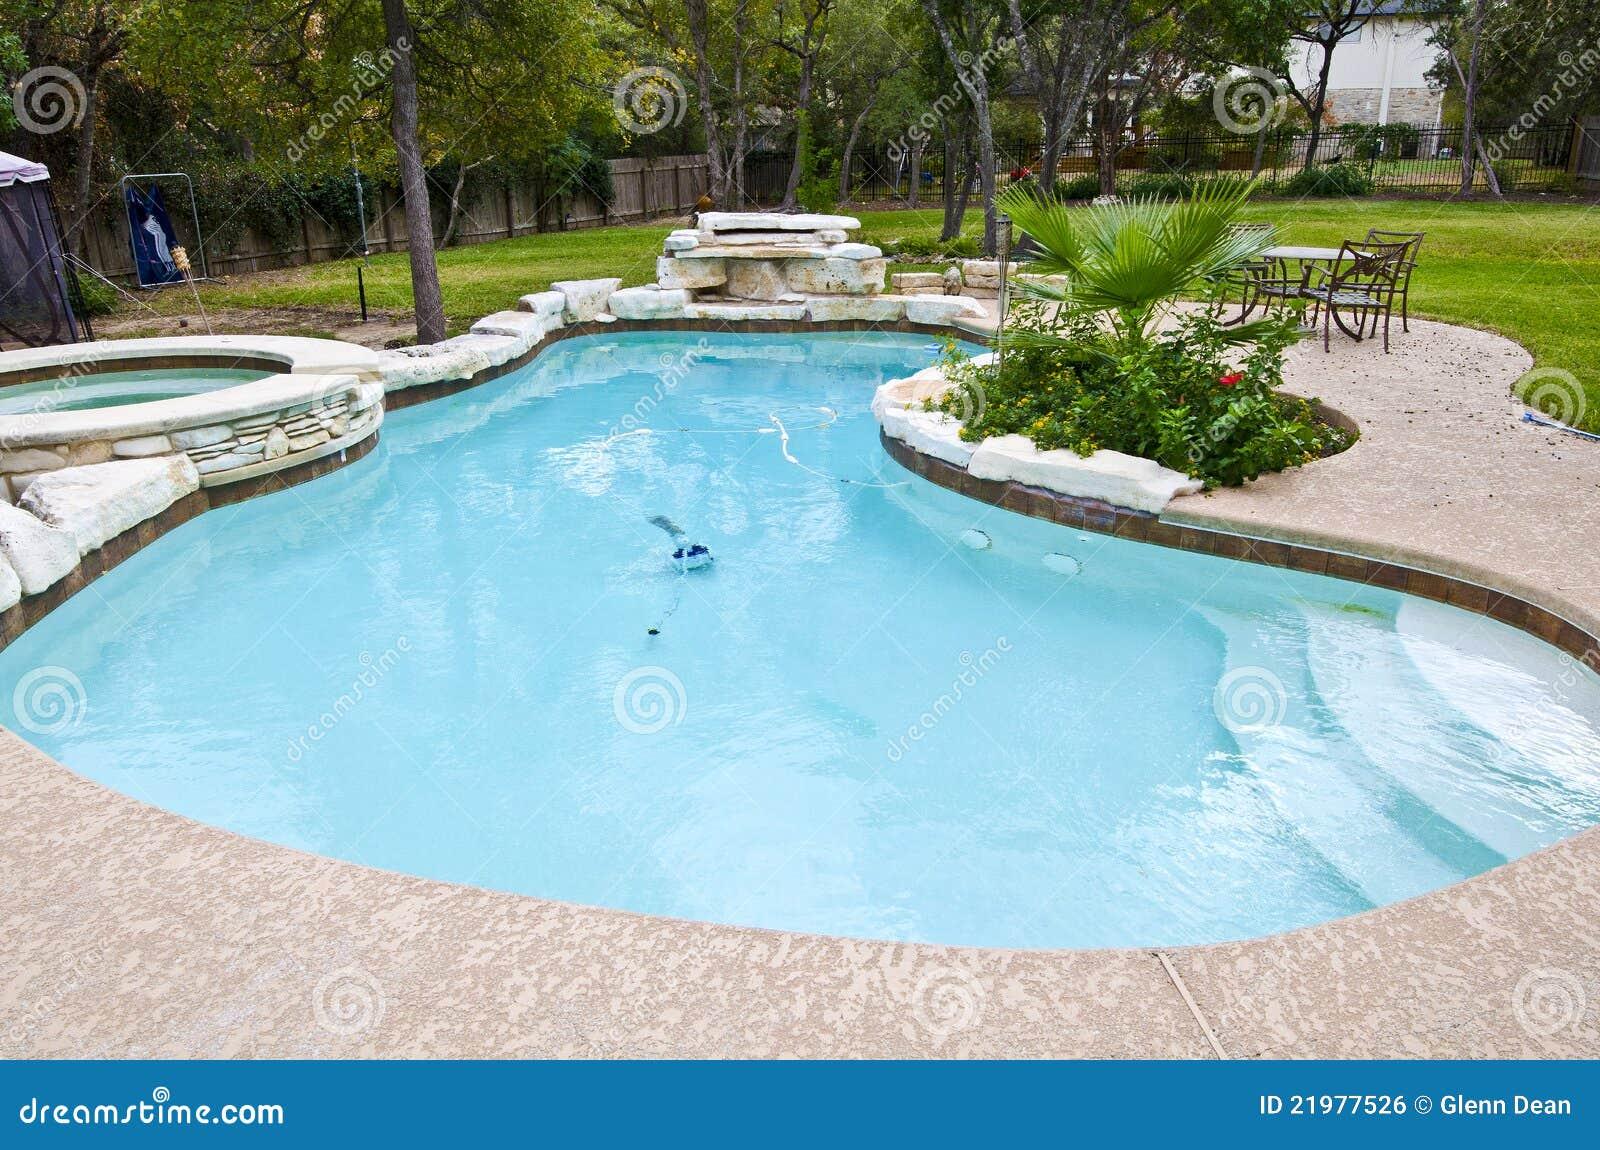 Backyard Swimming Pool Royalty Free Stock Image Image 21977526